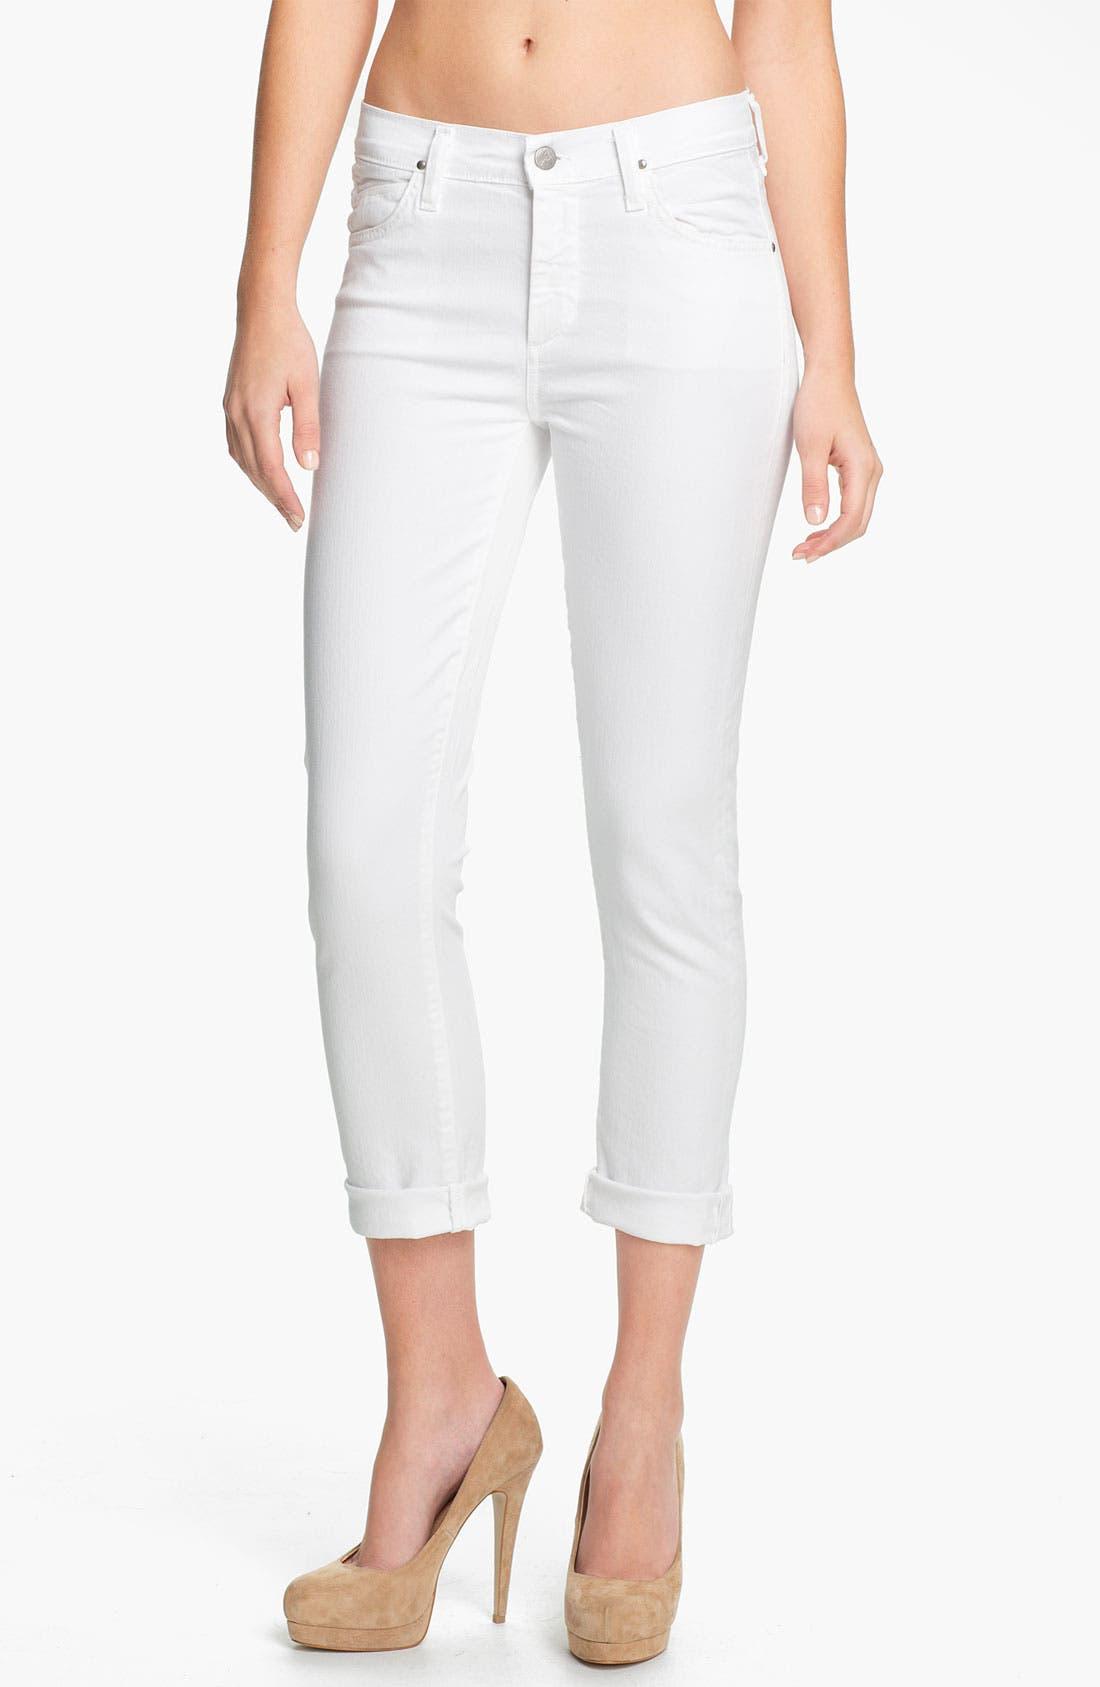 Alternate Image 1 Selected - Citizens of Humanity 'Carlton' High-Waist Slim Straight Leg Ankle Jeans (Santorini)